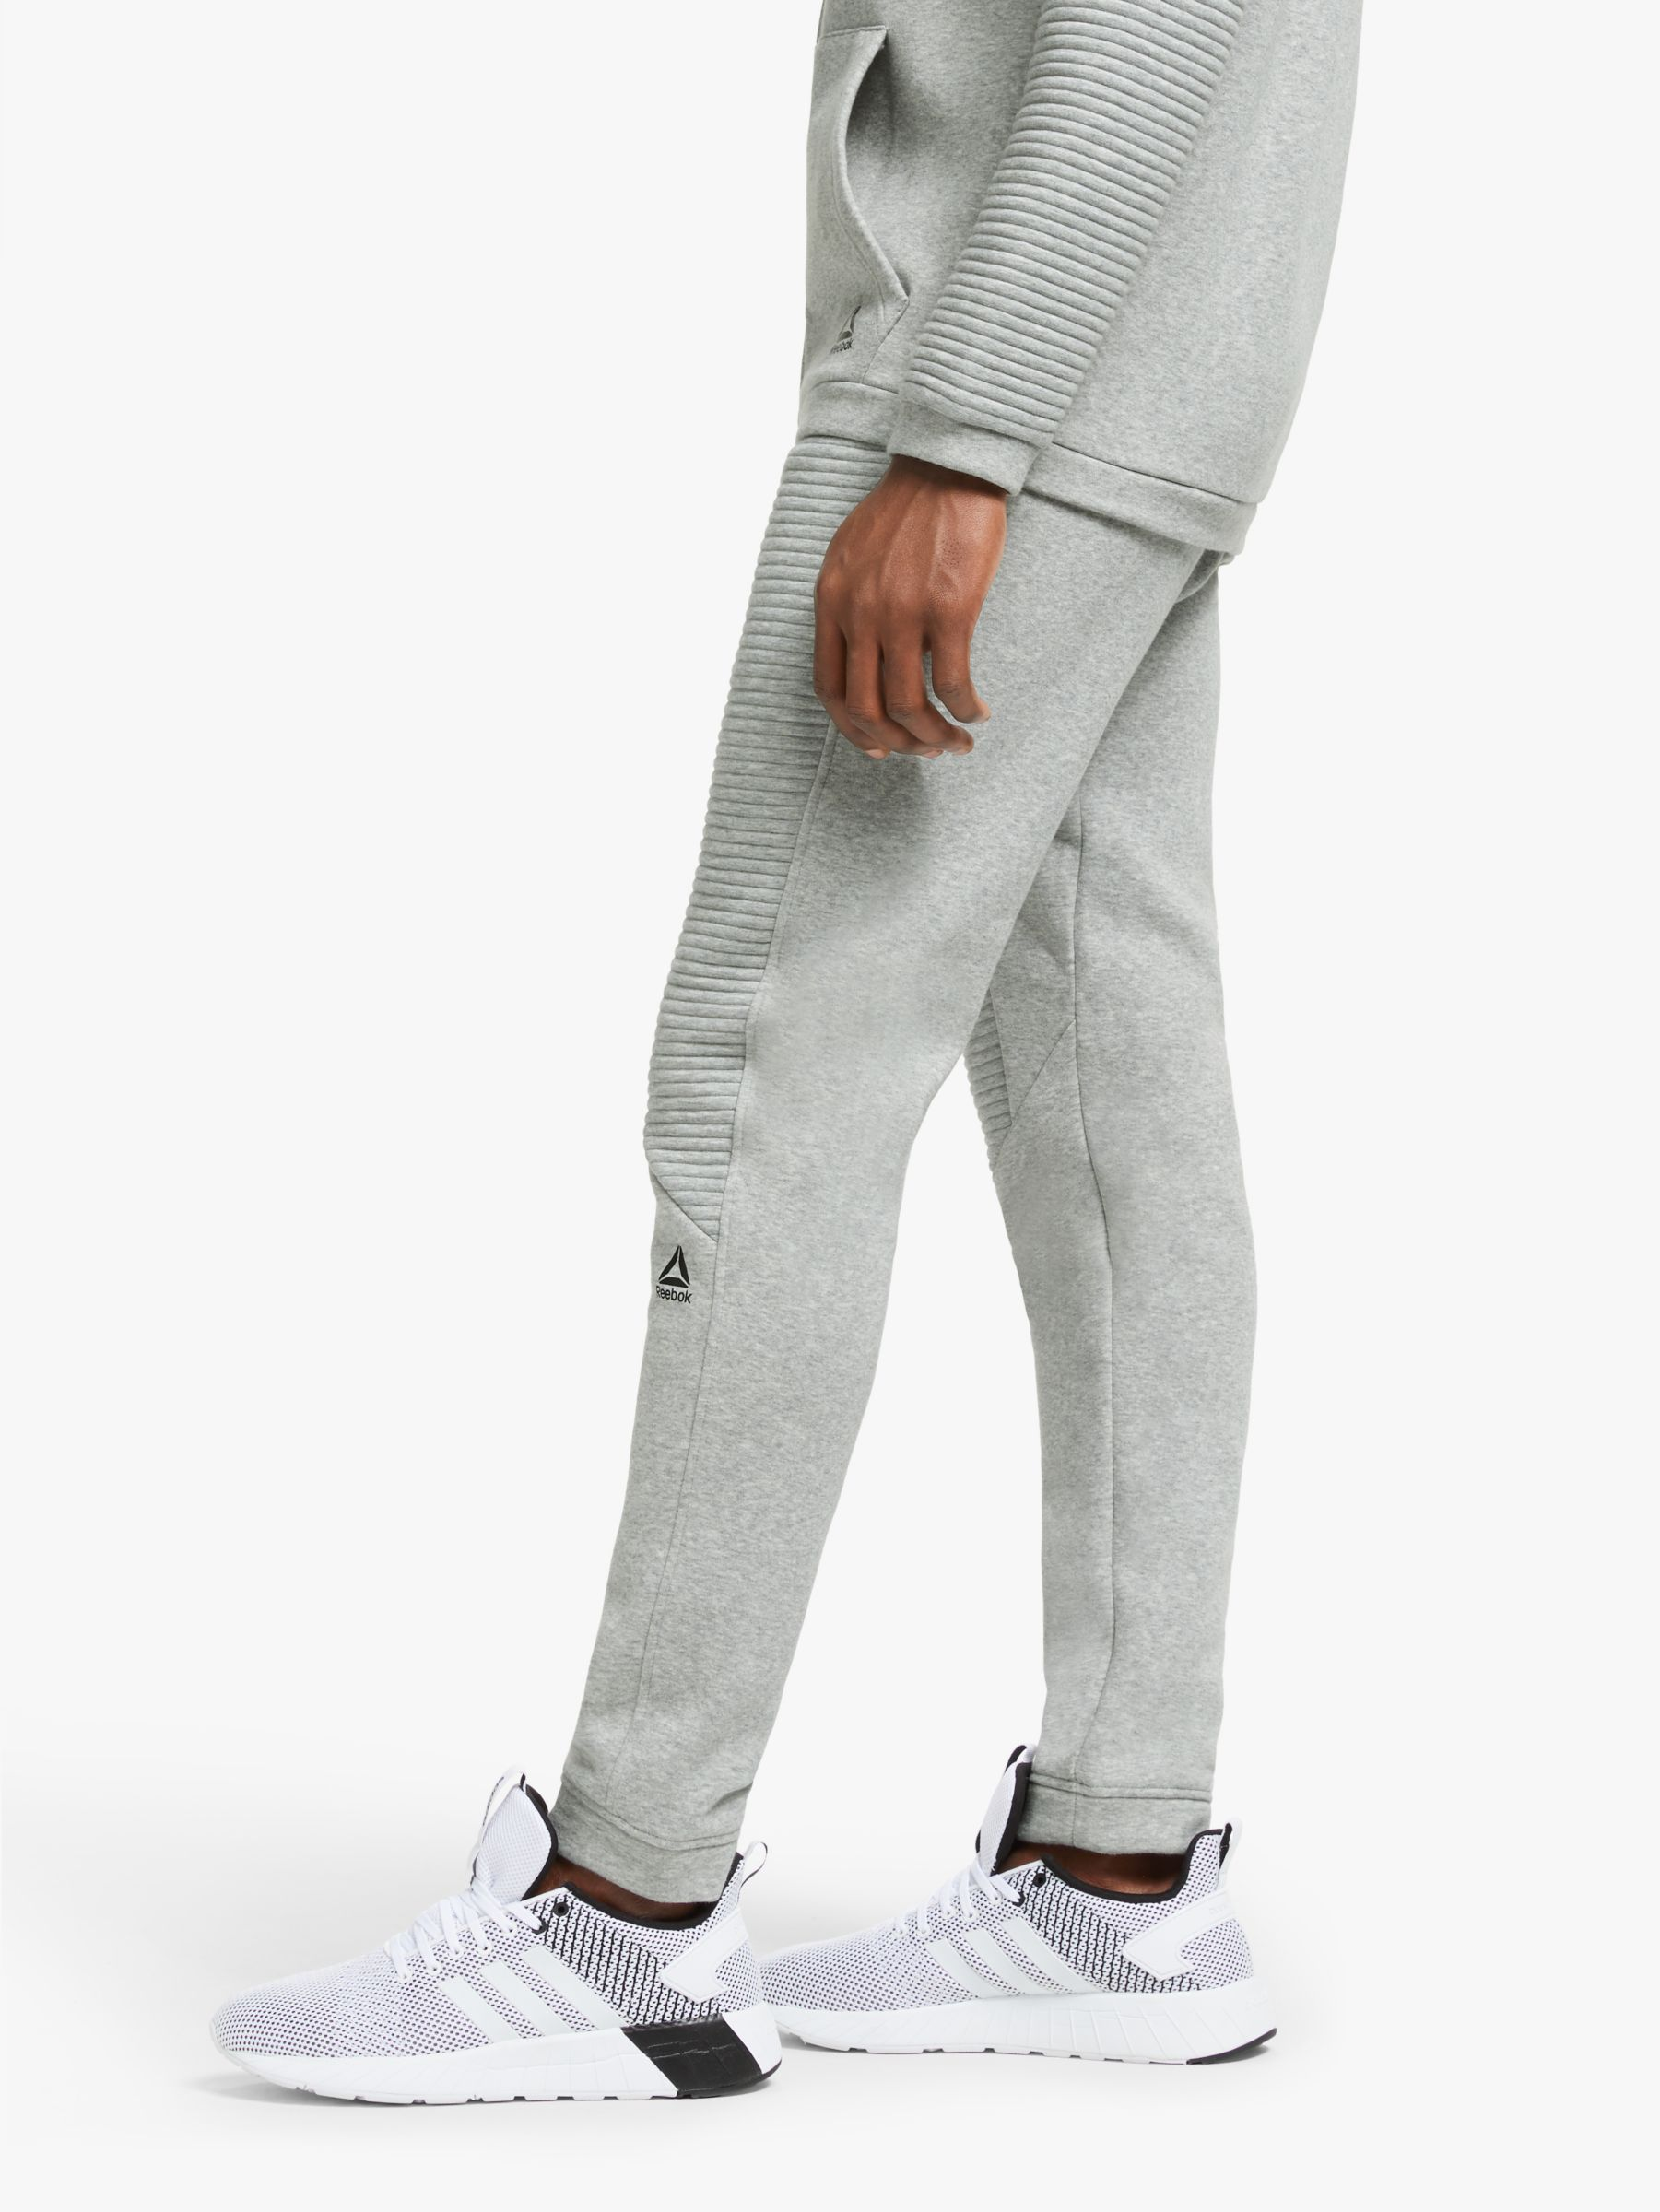 Reebok Work Out Ready Fleece Pant